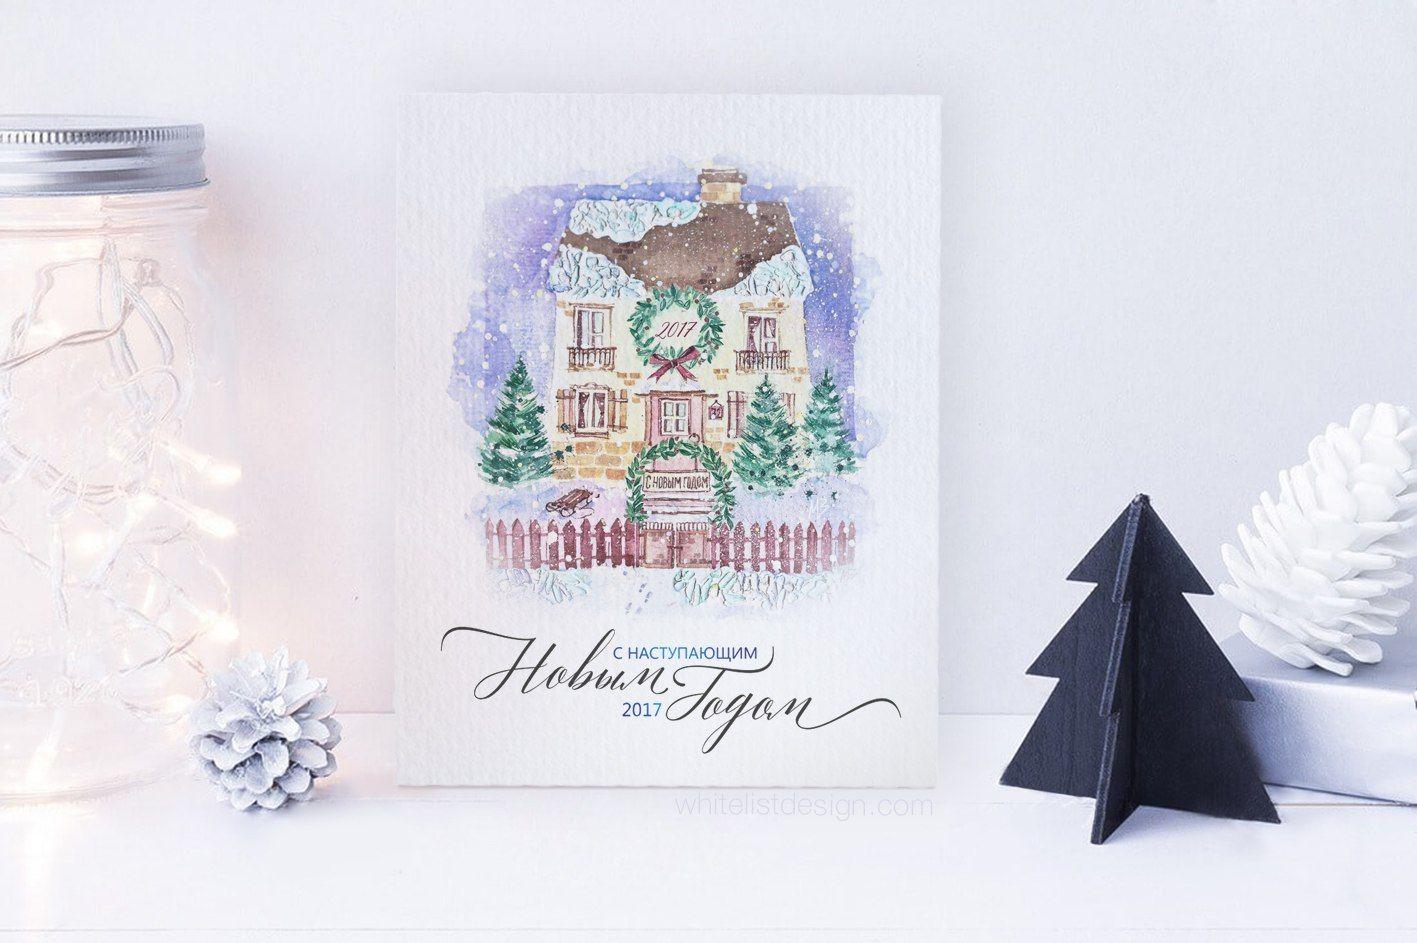 sweetgreen gift card us